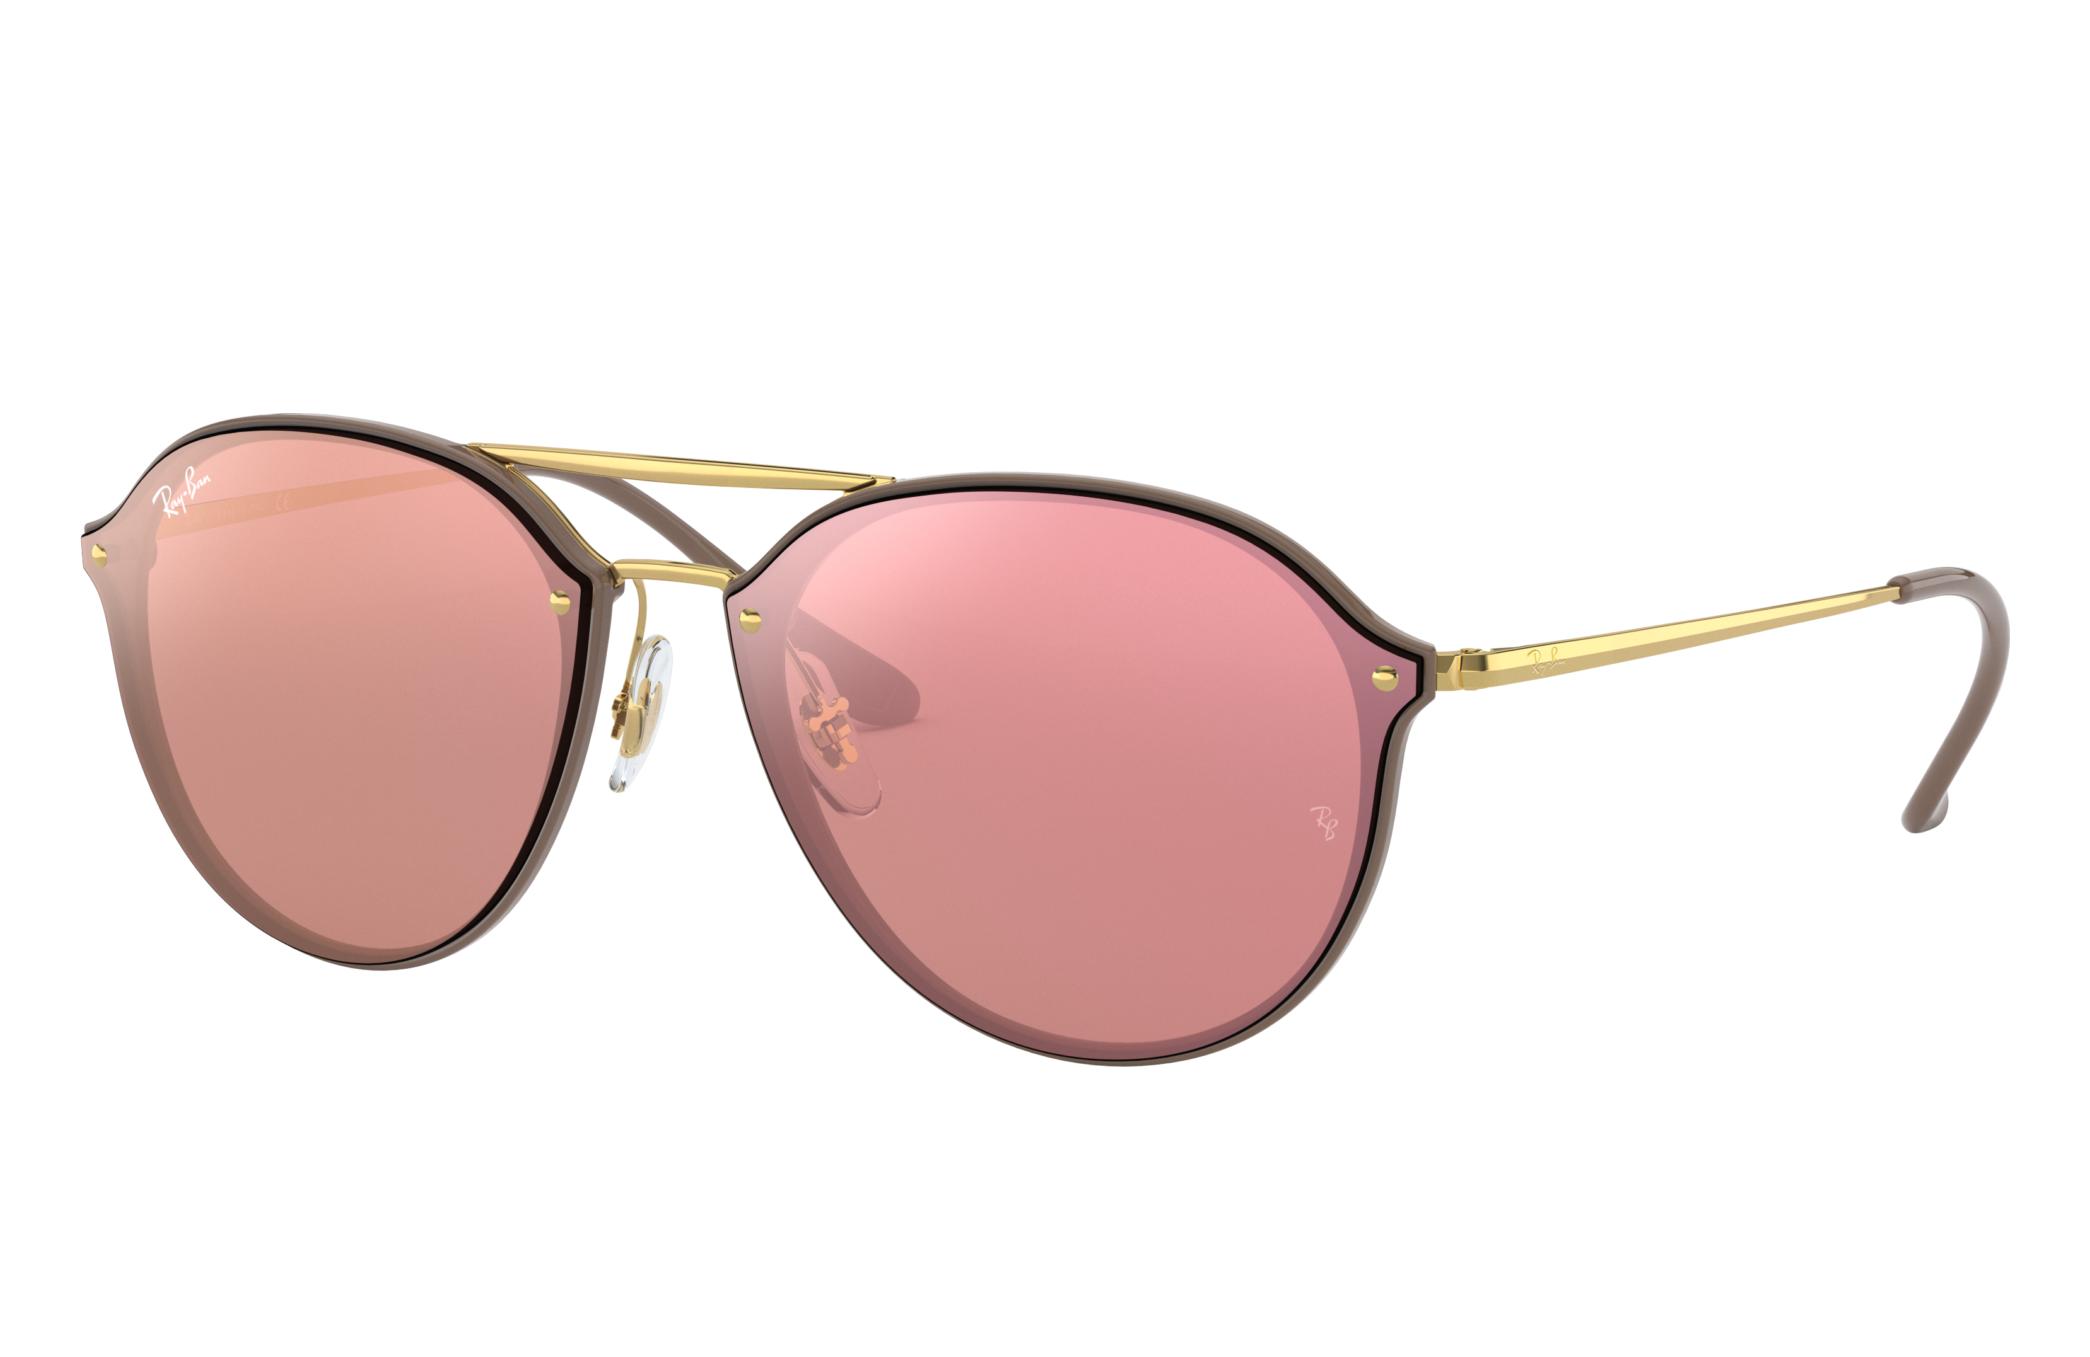 Ray-Ban Blaze Double Bridge Gold, Pink Lenses - RB4292N